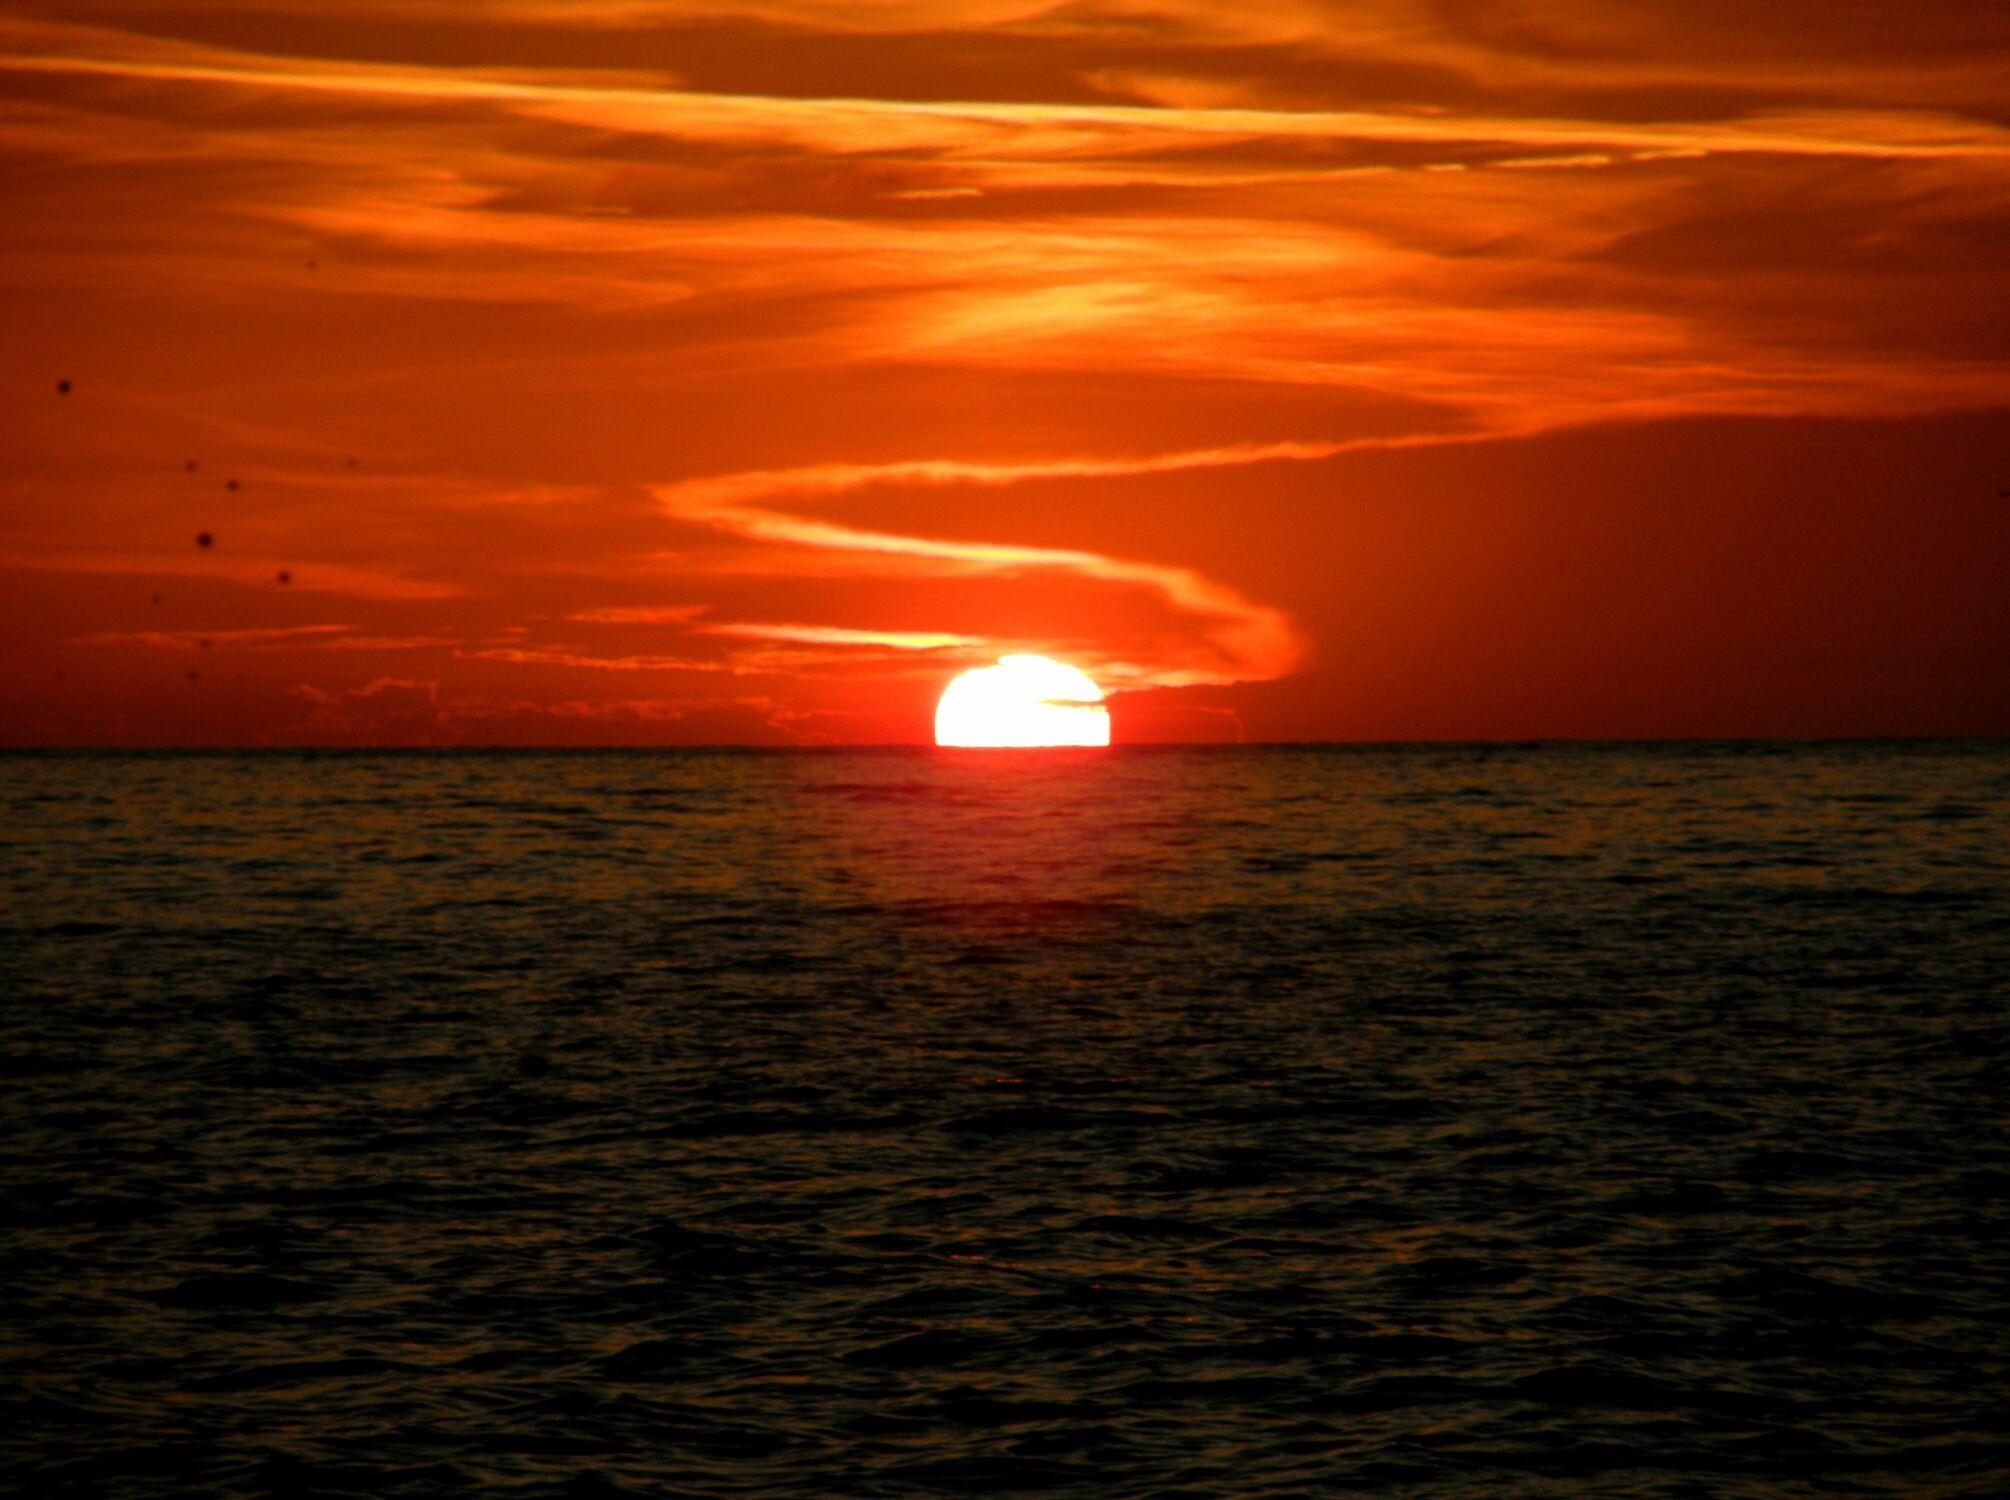 Bild mit Natur, Gewässer, Sonnenuntergang, Sonnenaufgang, Meerblick, Meer, Sunset